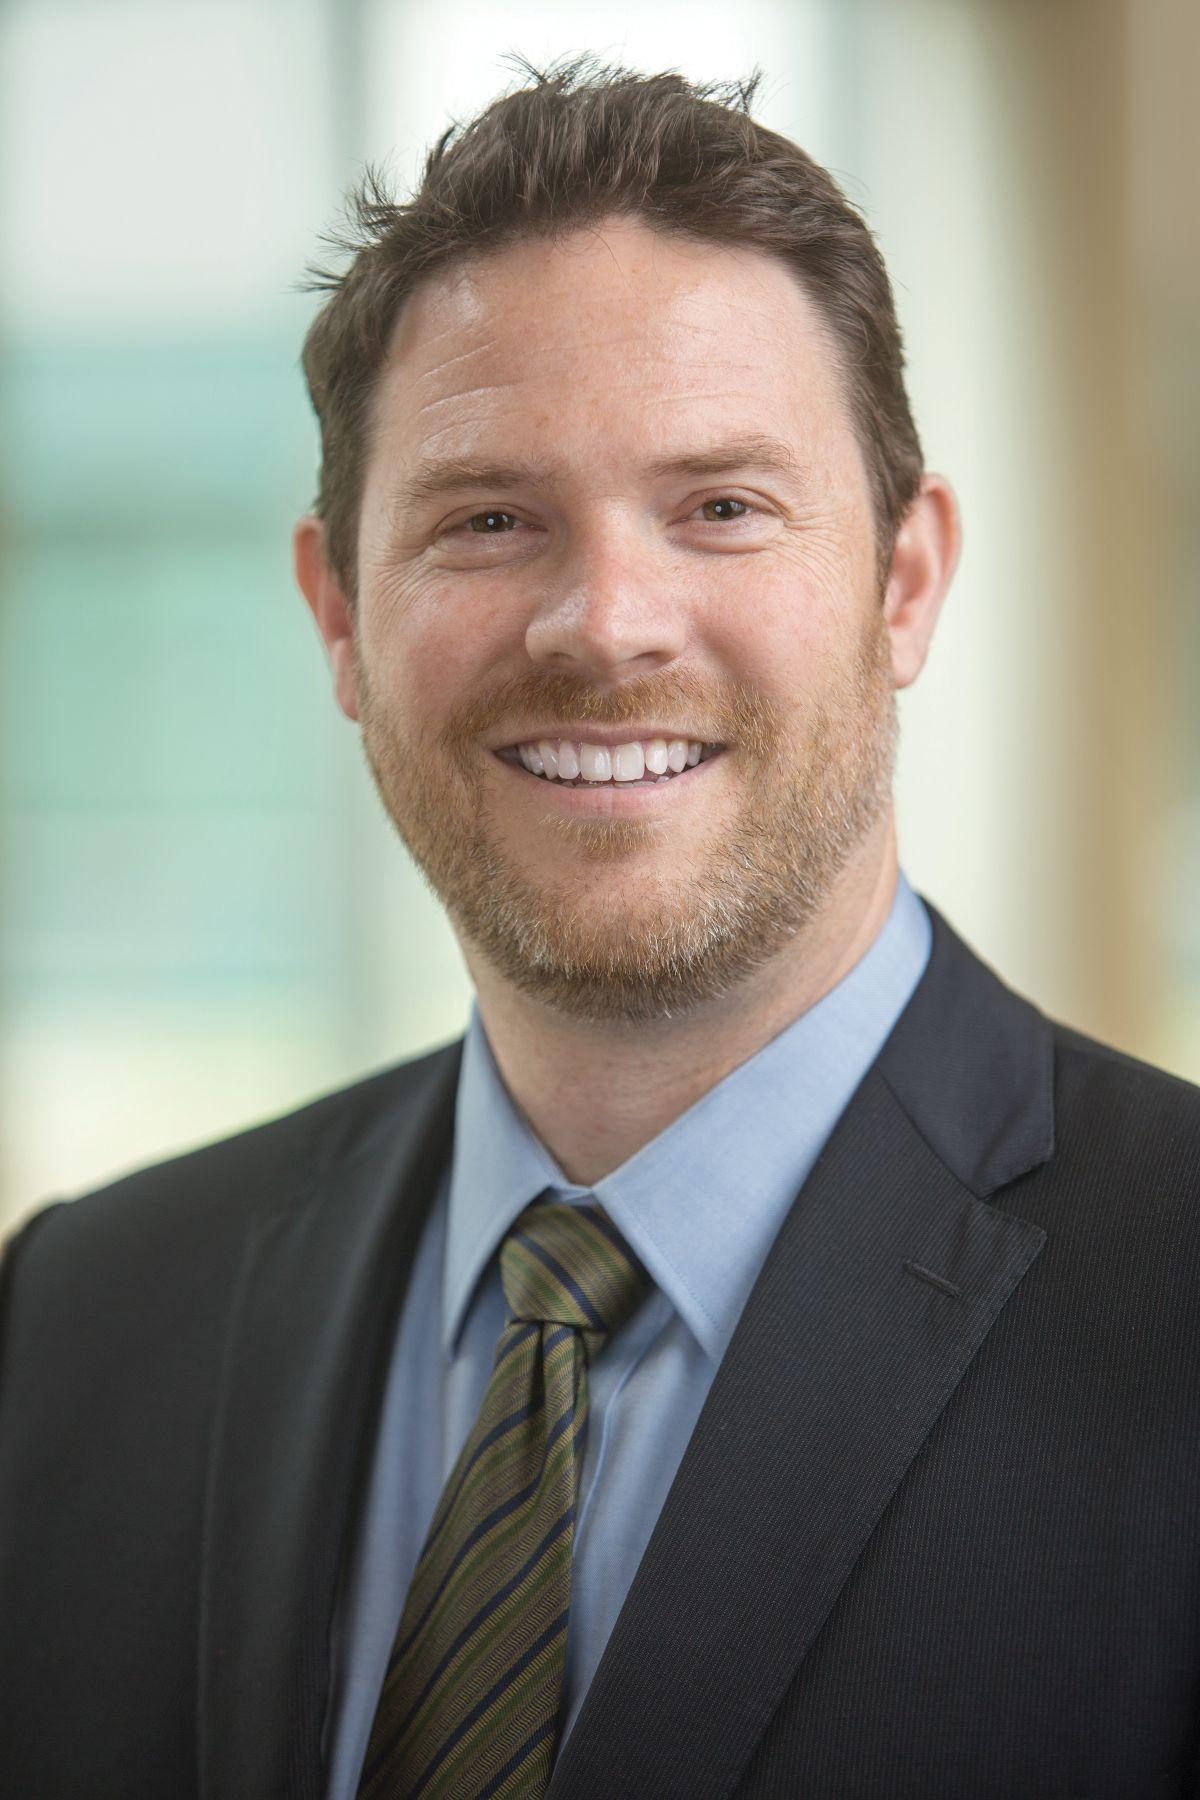 Christopher A. Longhurst, MD, MS